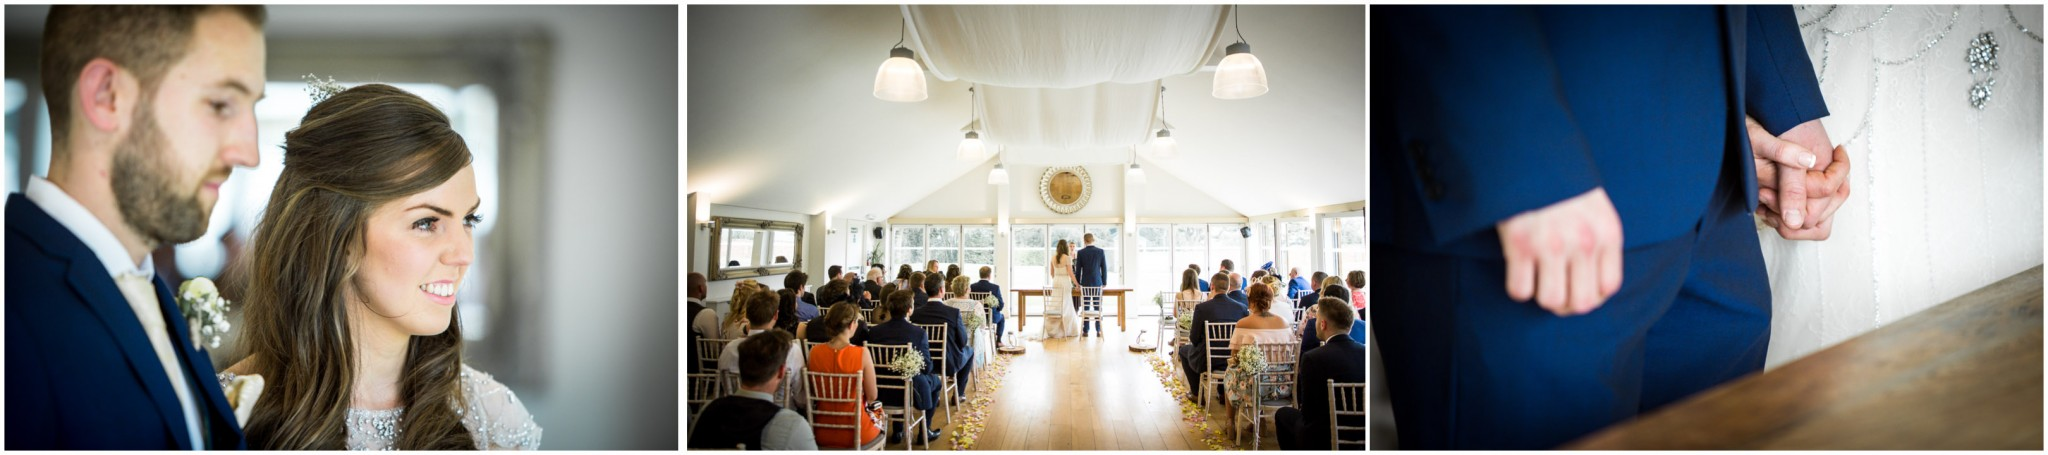 Wasing Park Wedding Photography Ceremony